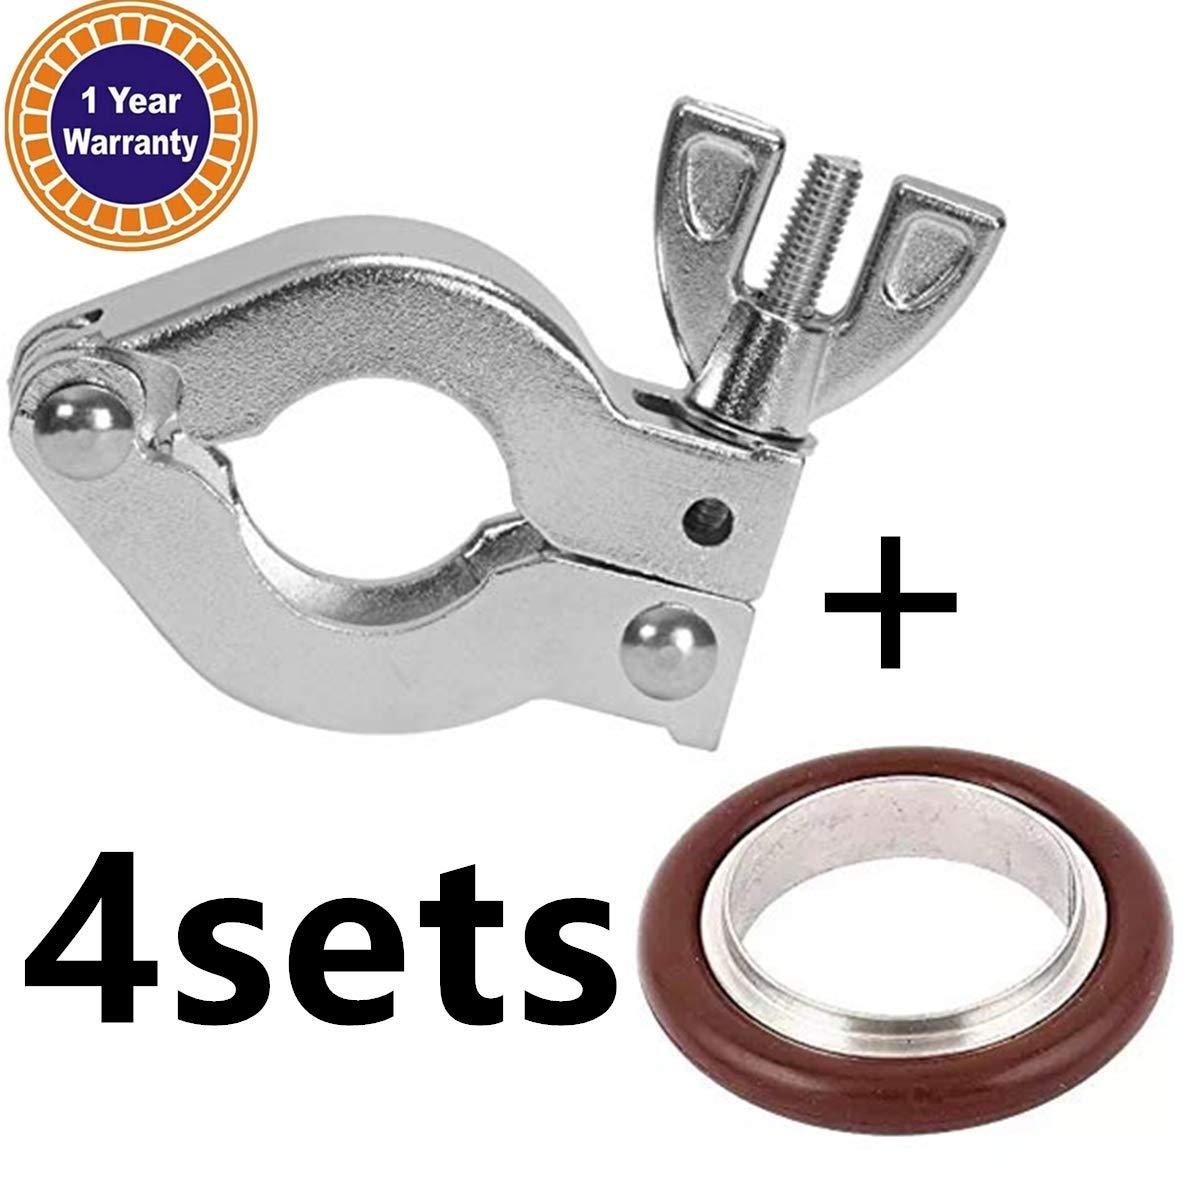 4 Sets KF-16 Aluminium Clamp Ring + KF16 Stainless Steel/Buna 304 Centering Ring FKM